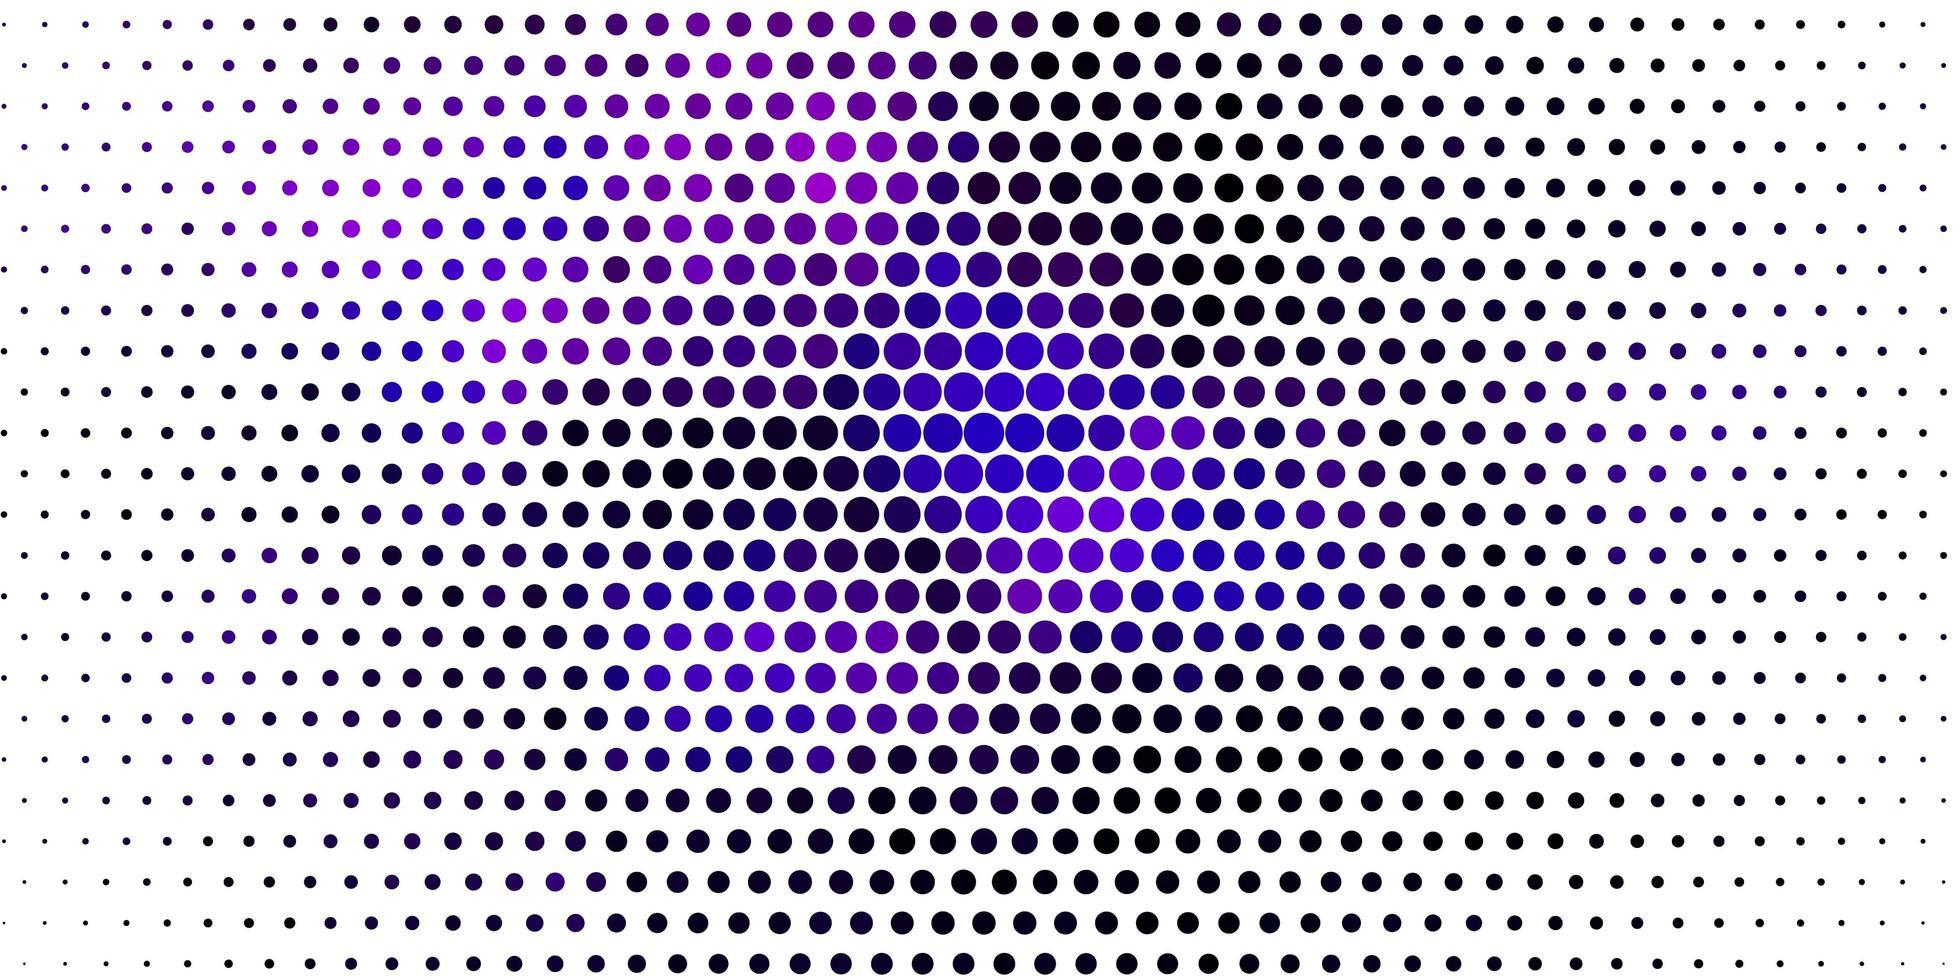 lila Layout mit Kreisformen. vektor